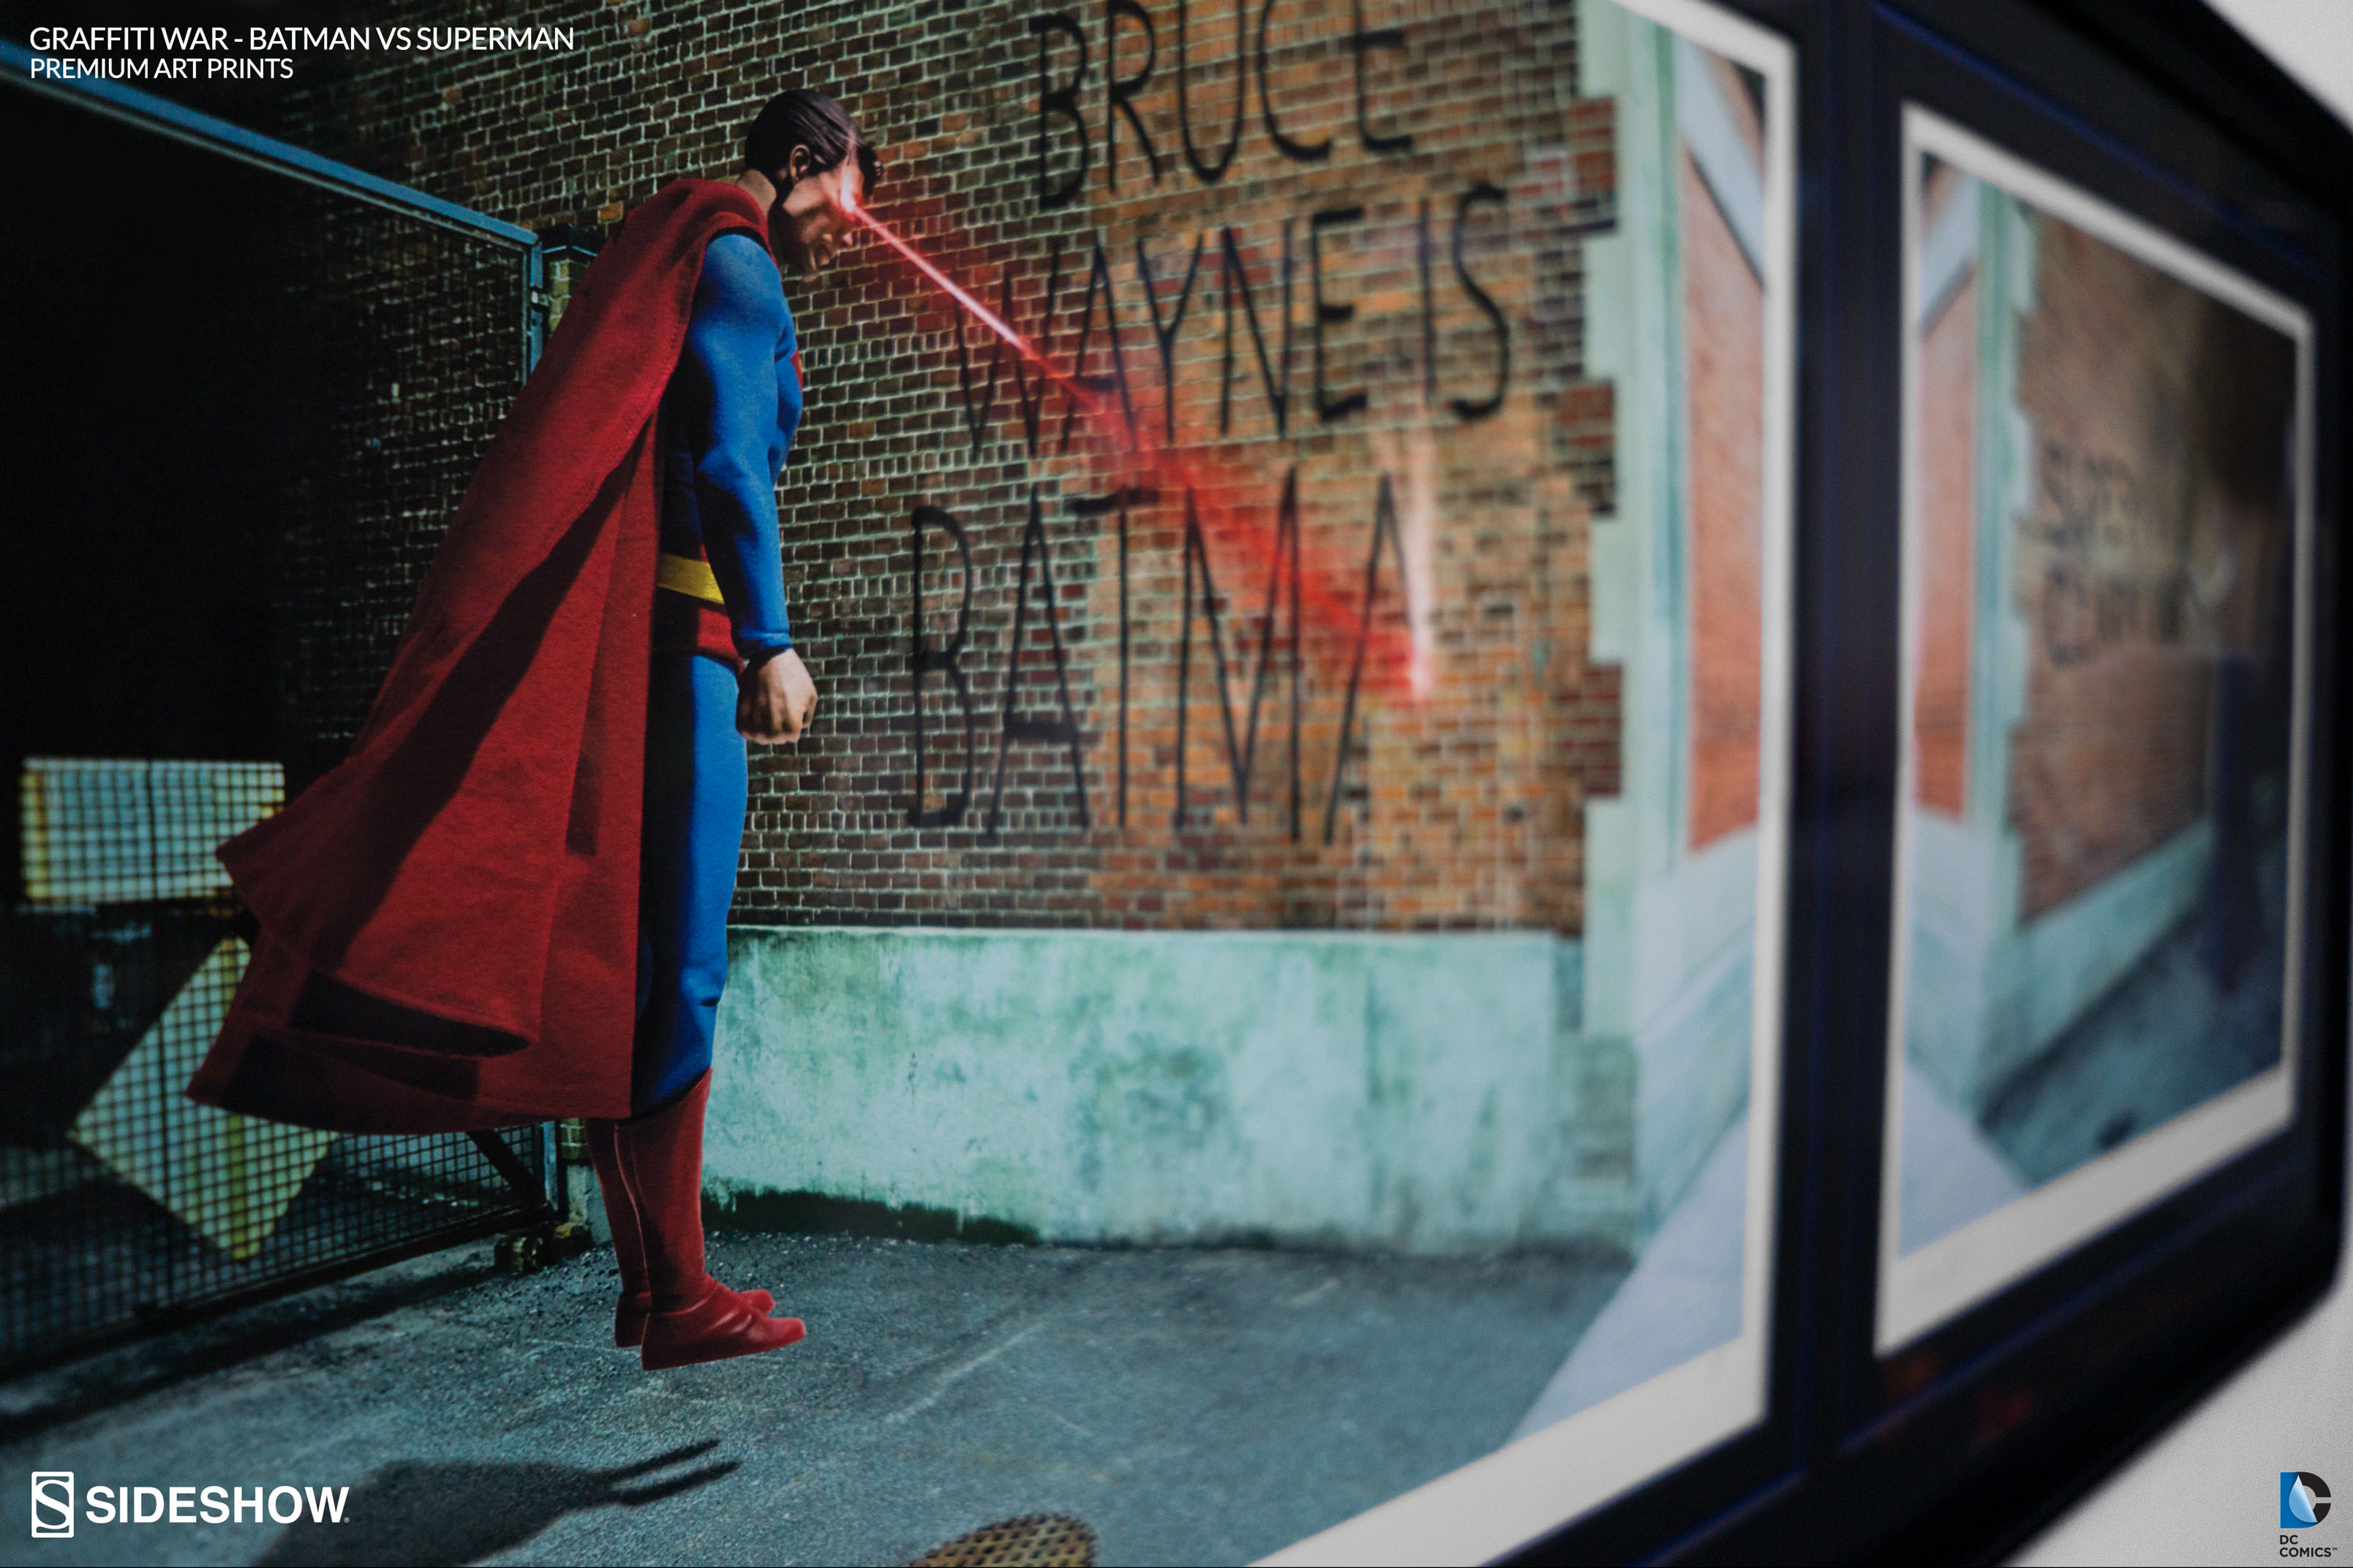 "March 25, 2016: ""Graffiti War: Batman vs Superman"" Premium Art Print"